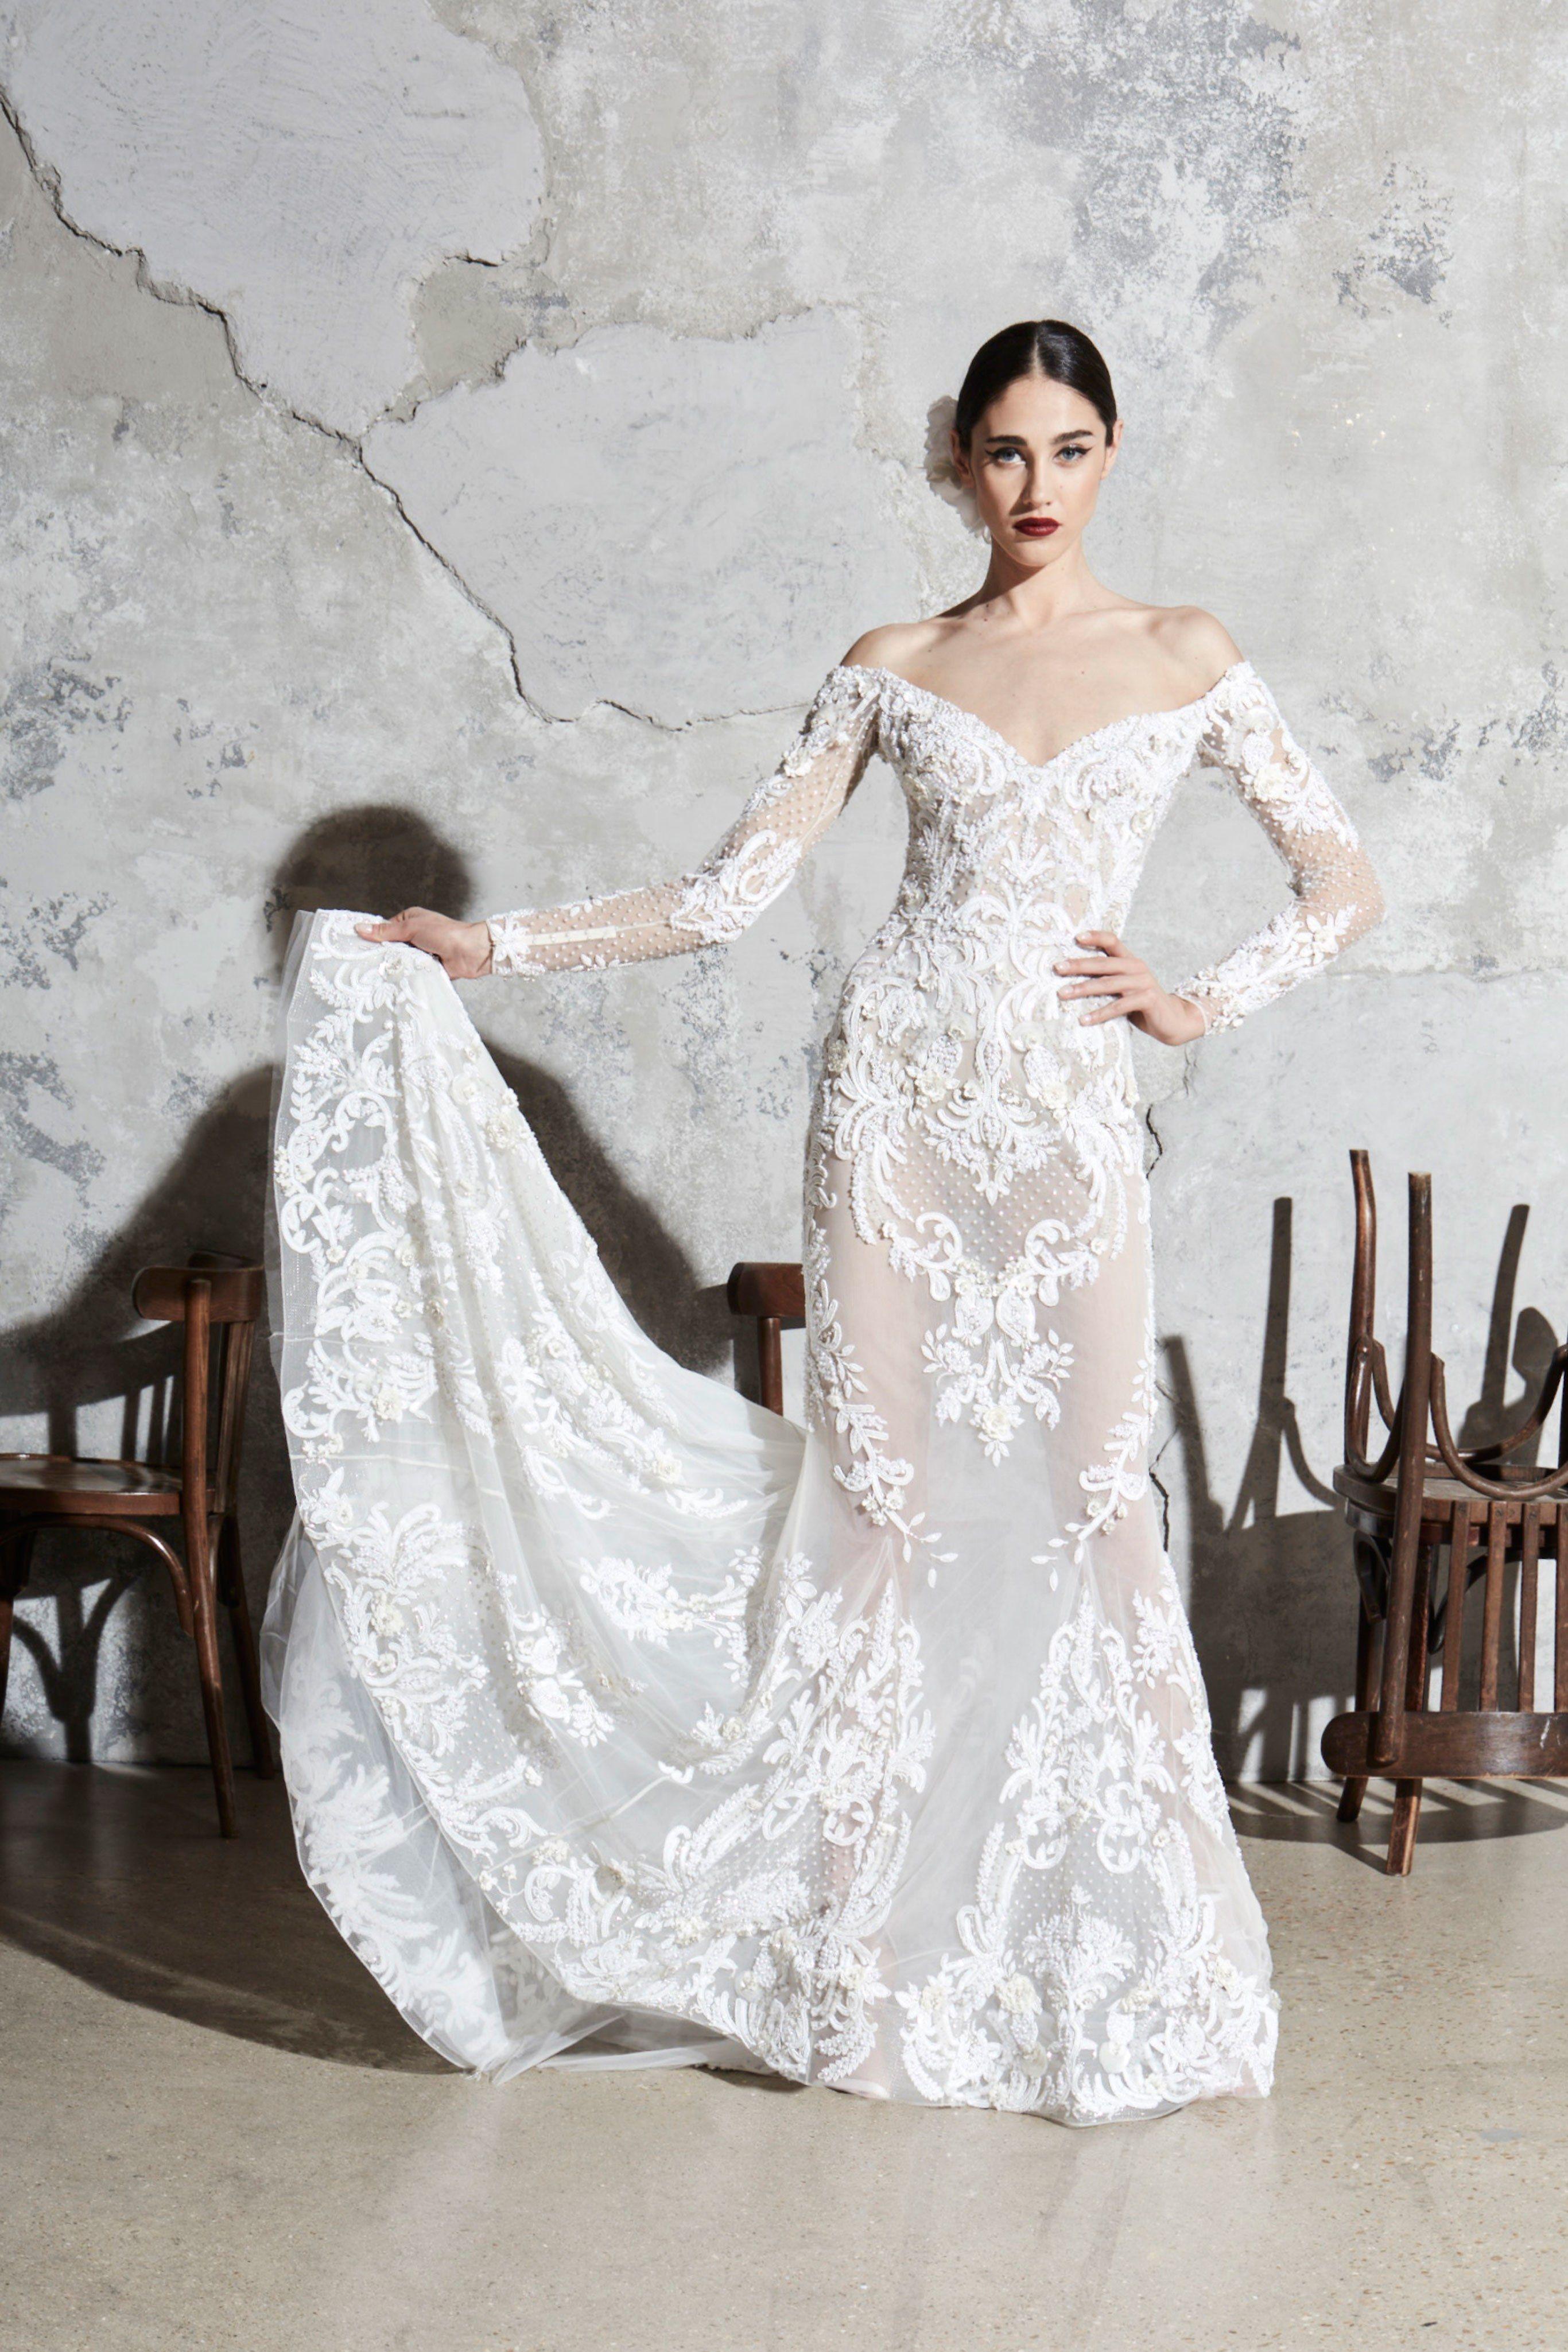 Zuhair Murad Bridal Spring 2020 Fashion Show Zuhair Murad Bridal Wedding Dresses Beaded Zuhair Murad Dresses